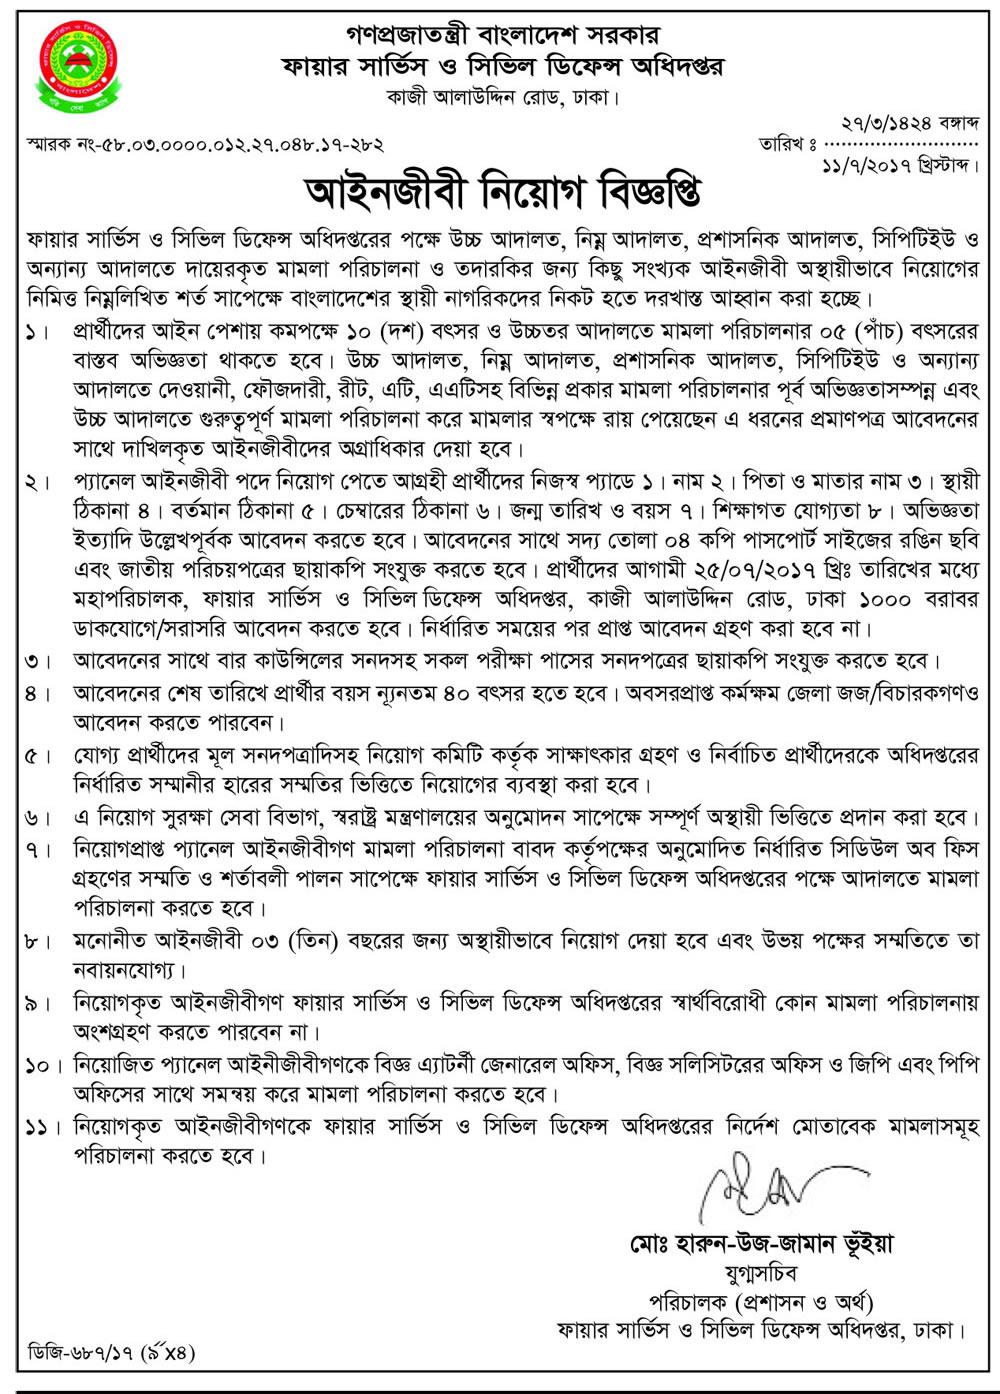 Bangladesh Fire Service and Civil Defense Job Circular 2017